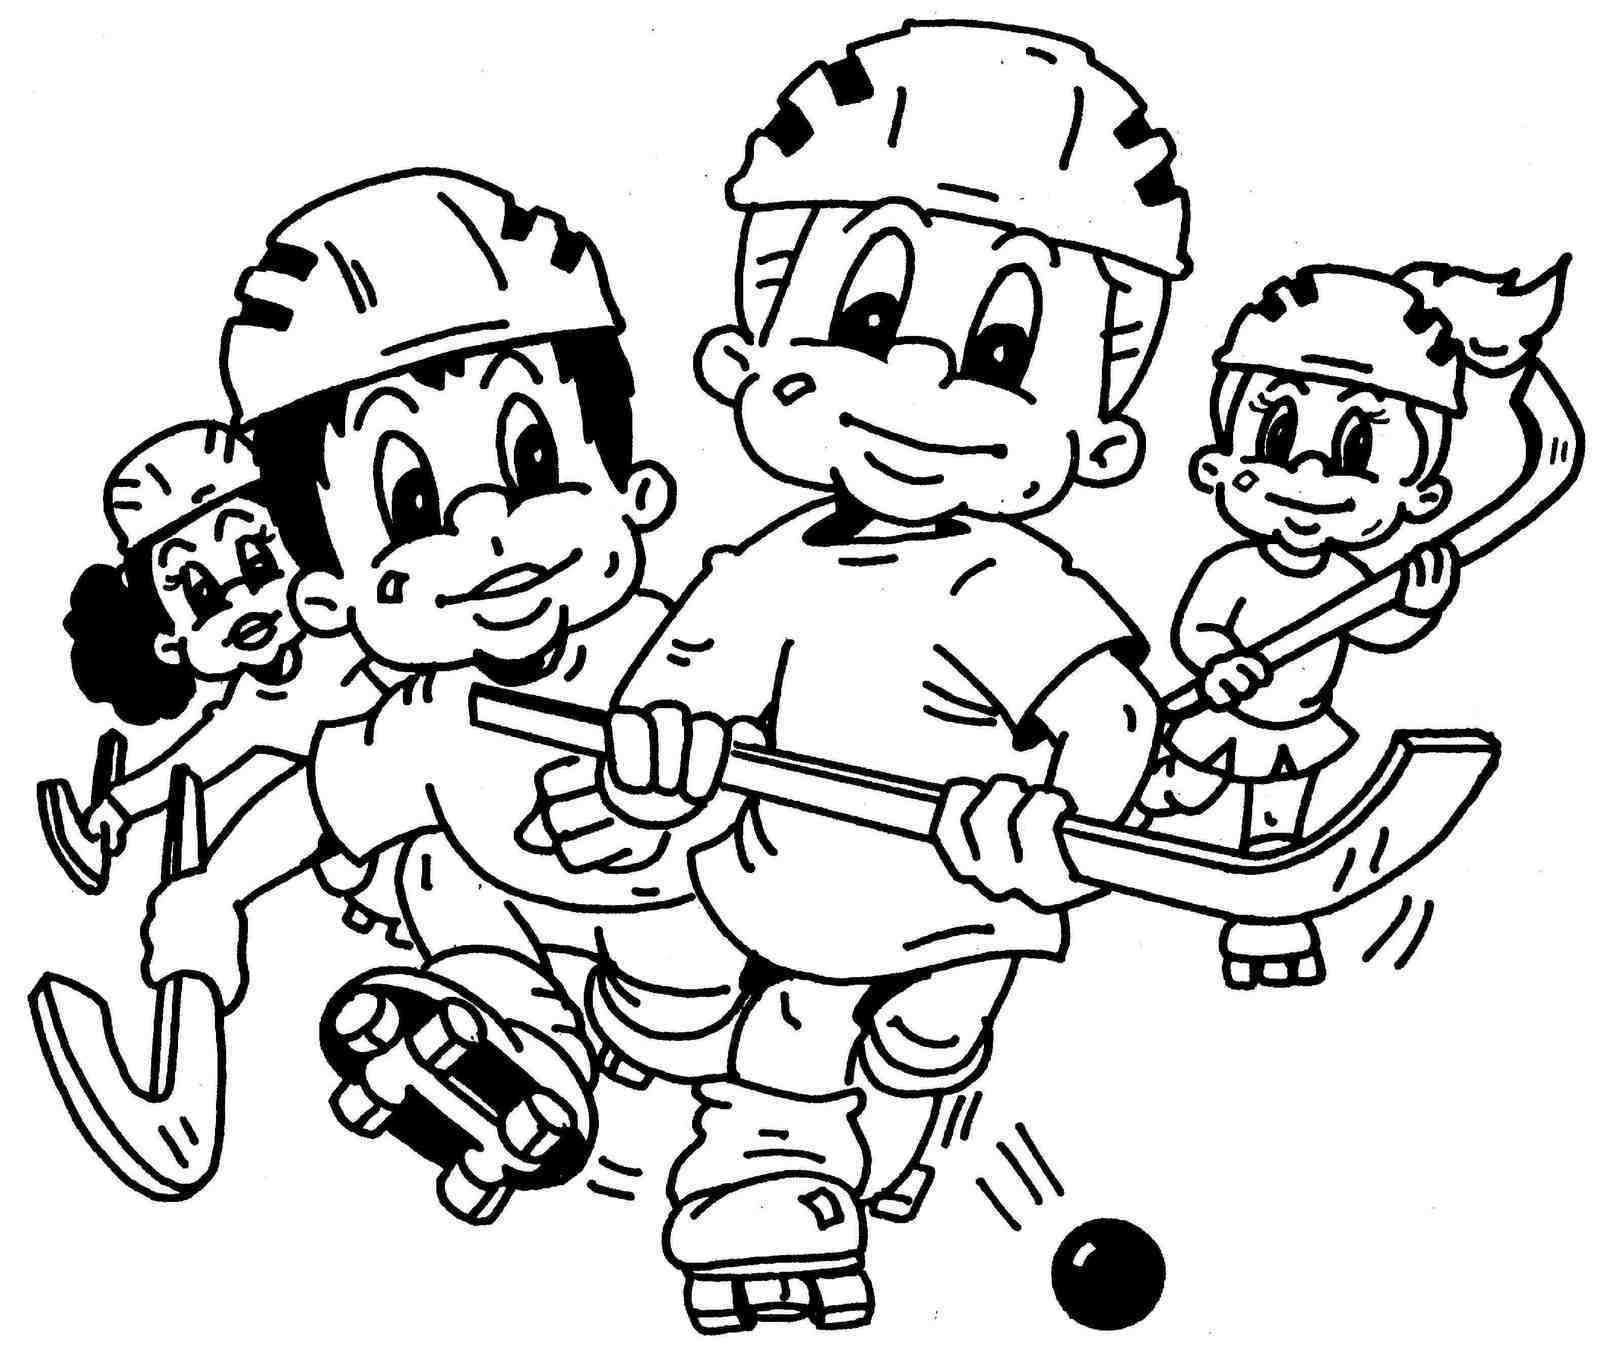 hockey kids coloring sheet printable | sport coloring page | Pinterest